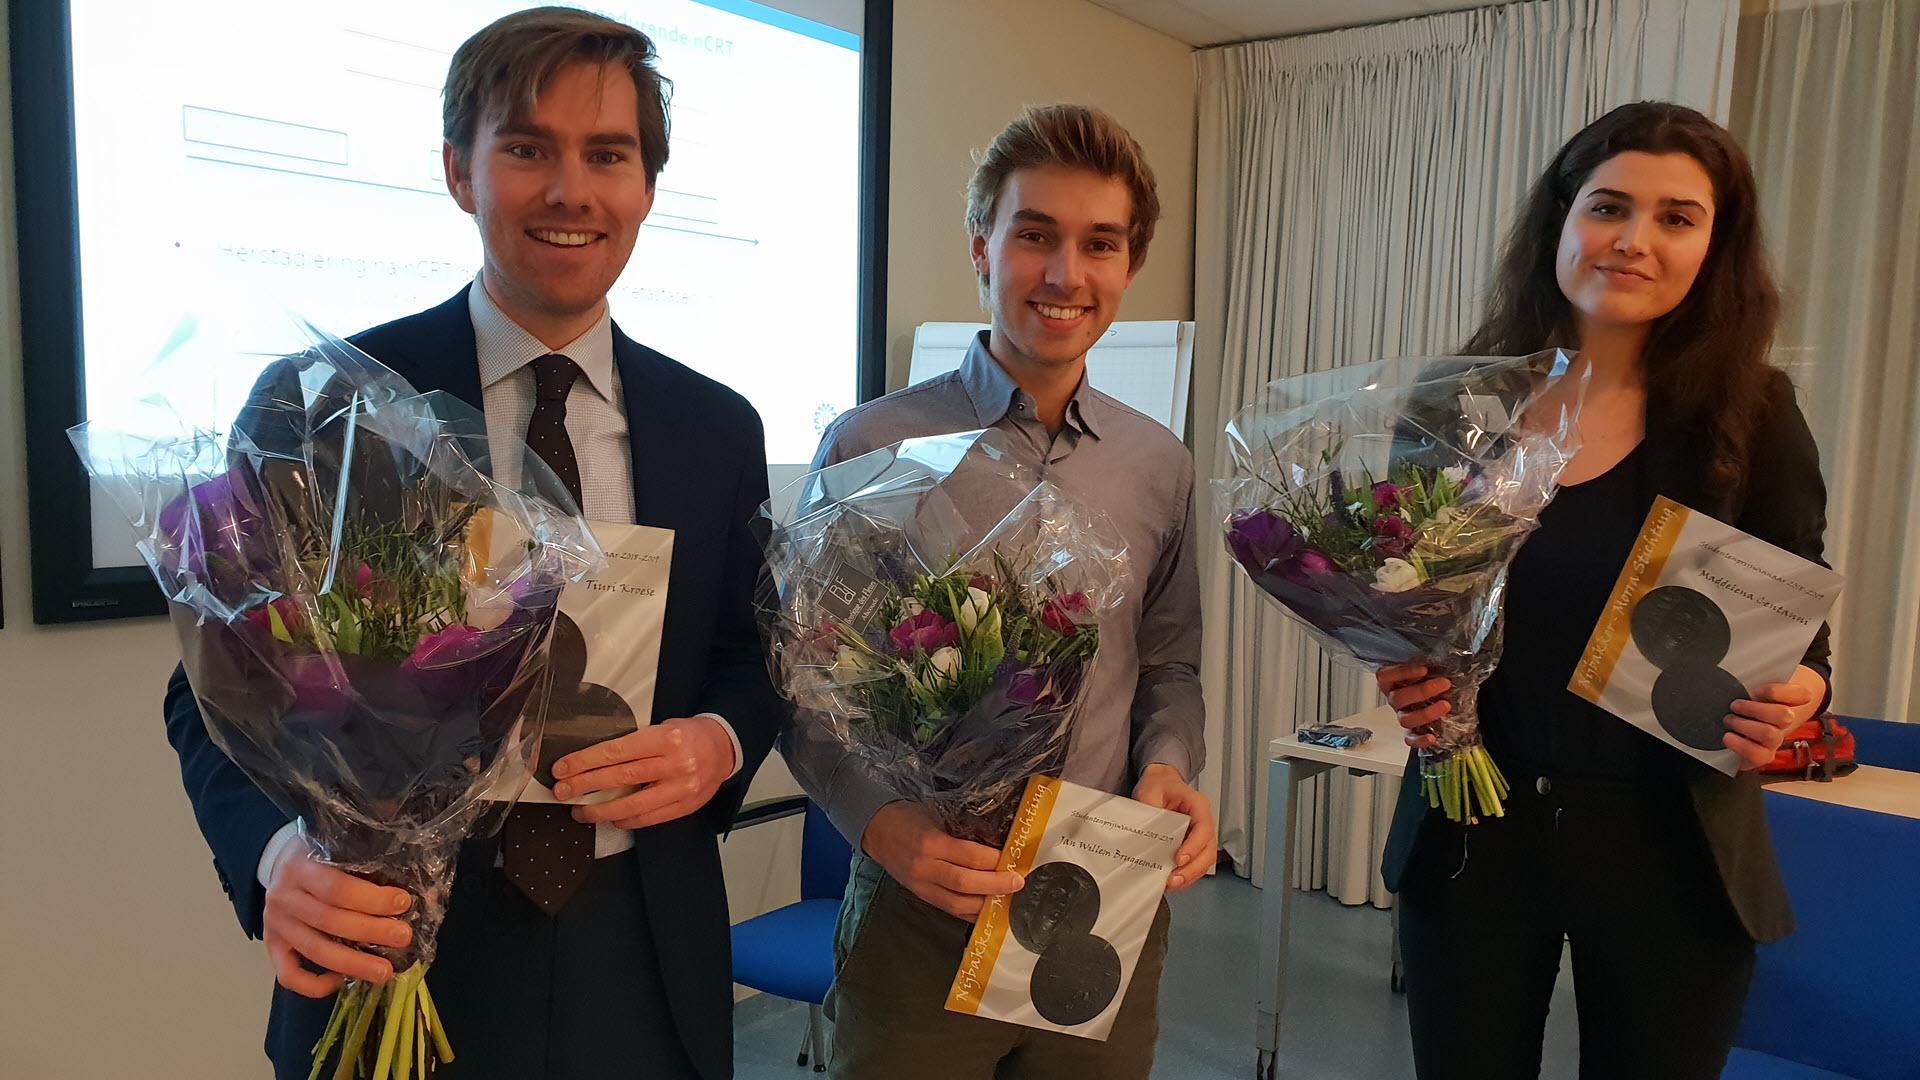 Nijbakker-Morra Stichting Prijswinnaars 2018-19